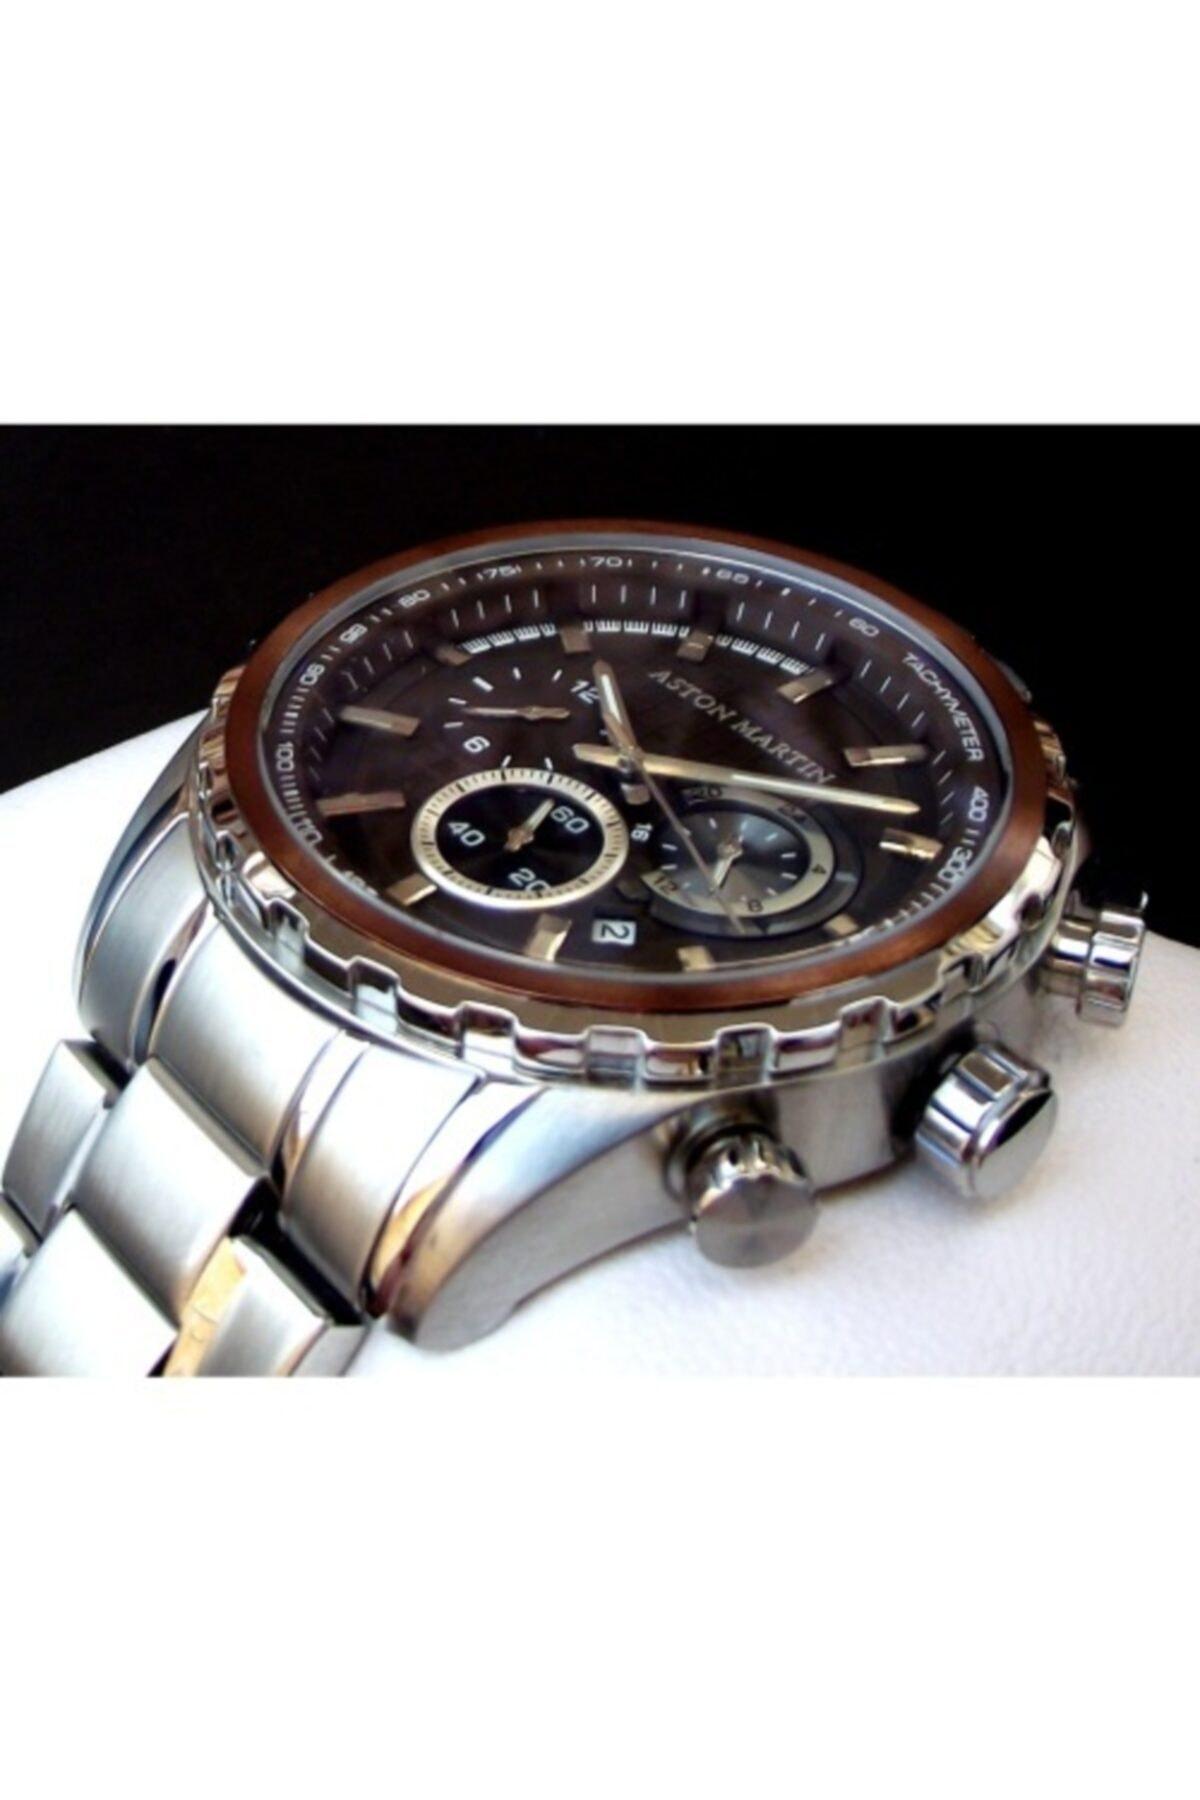 Aston Martin As404-27 Kronometreli Erkek Kol Saati 2